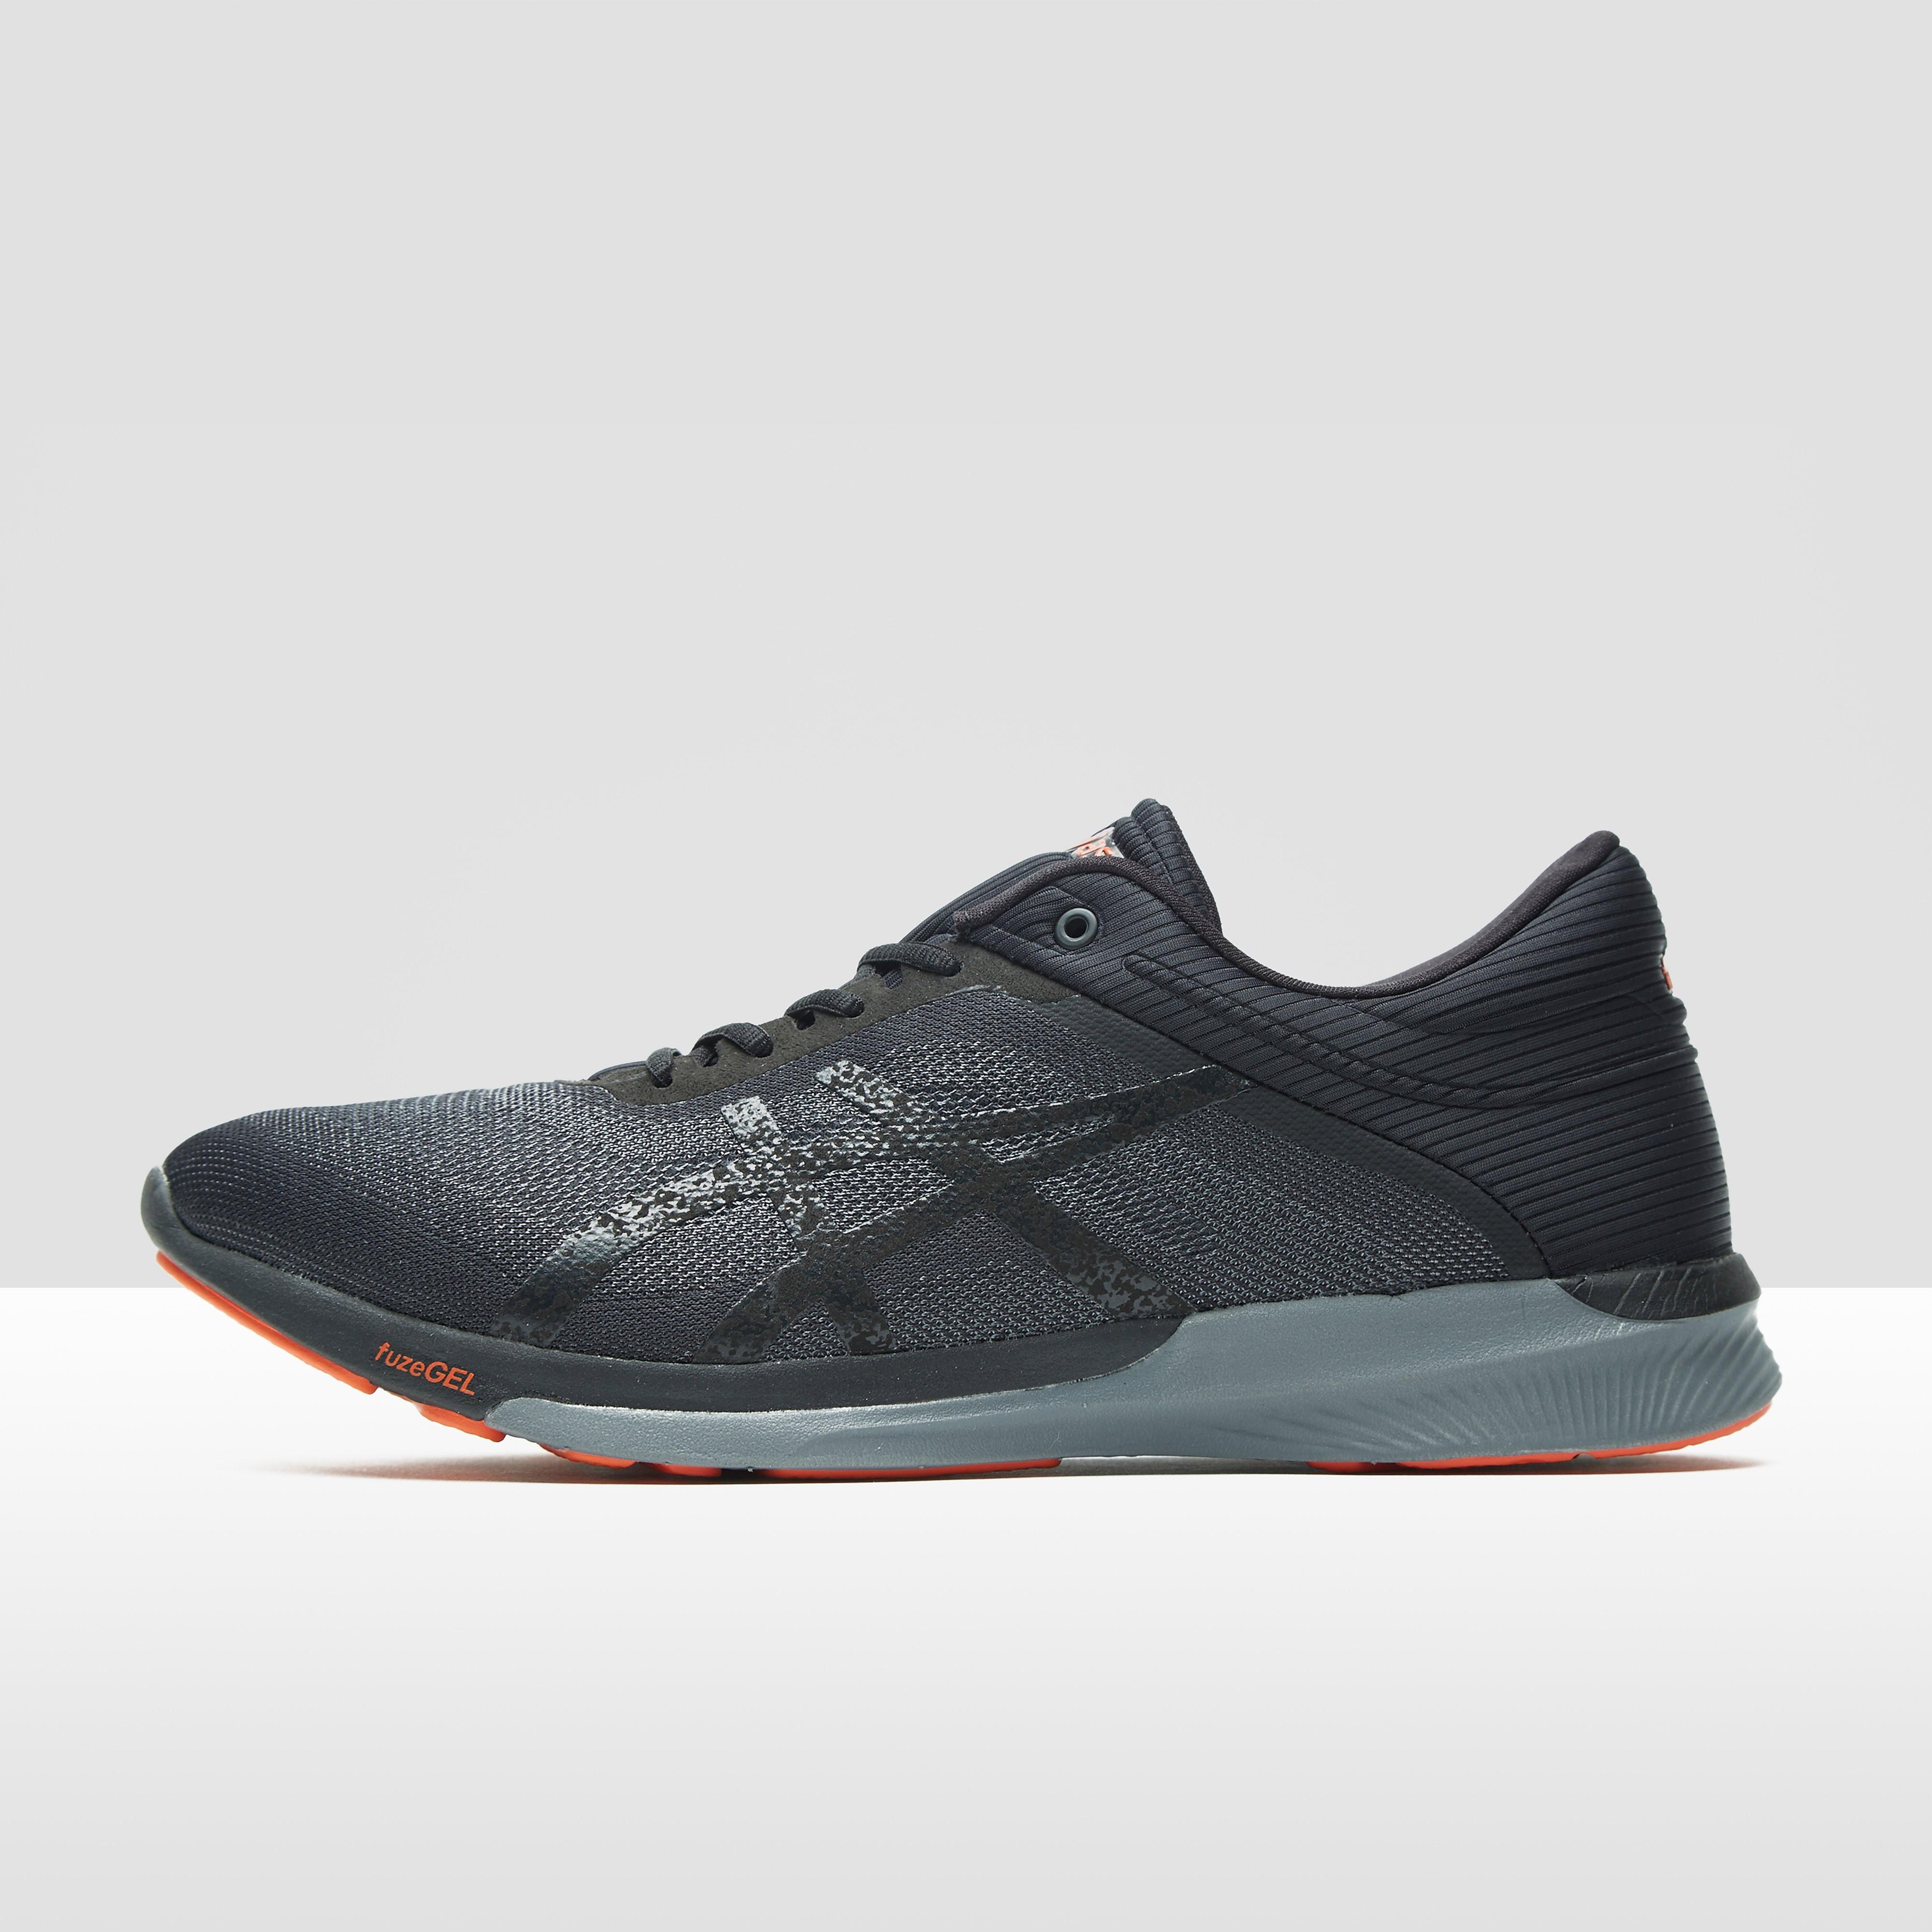 ASICS Fuze X Rush Men's Running Shoes